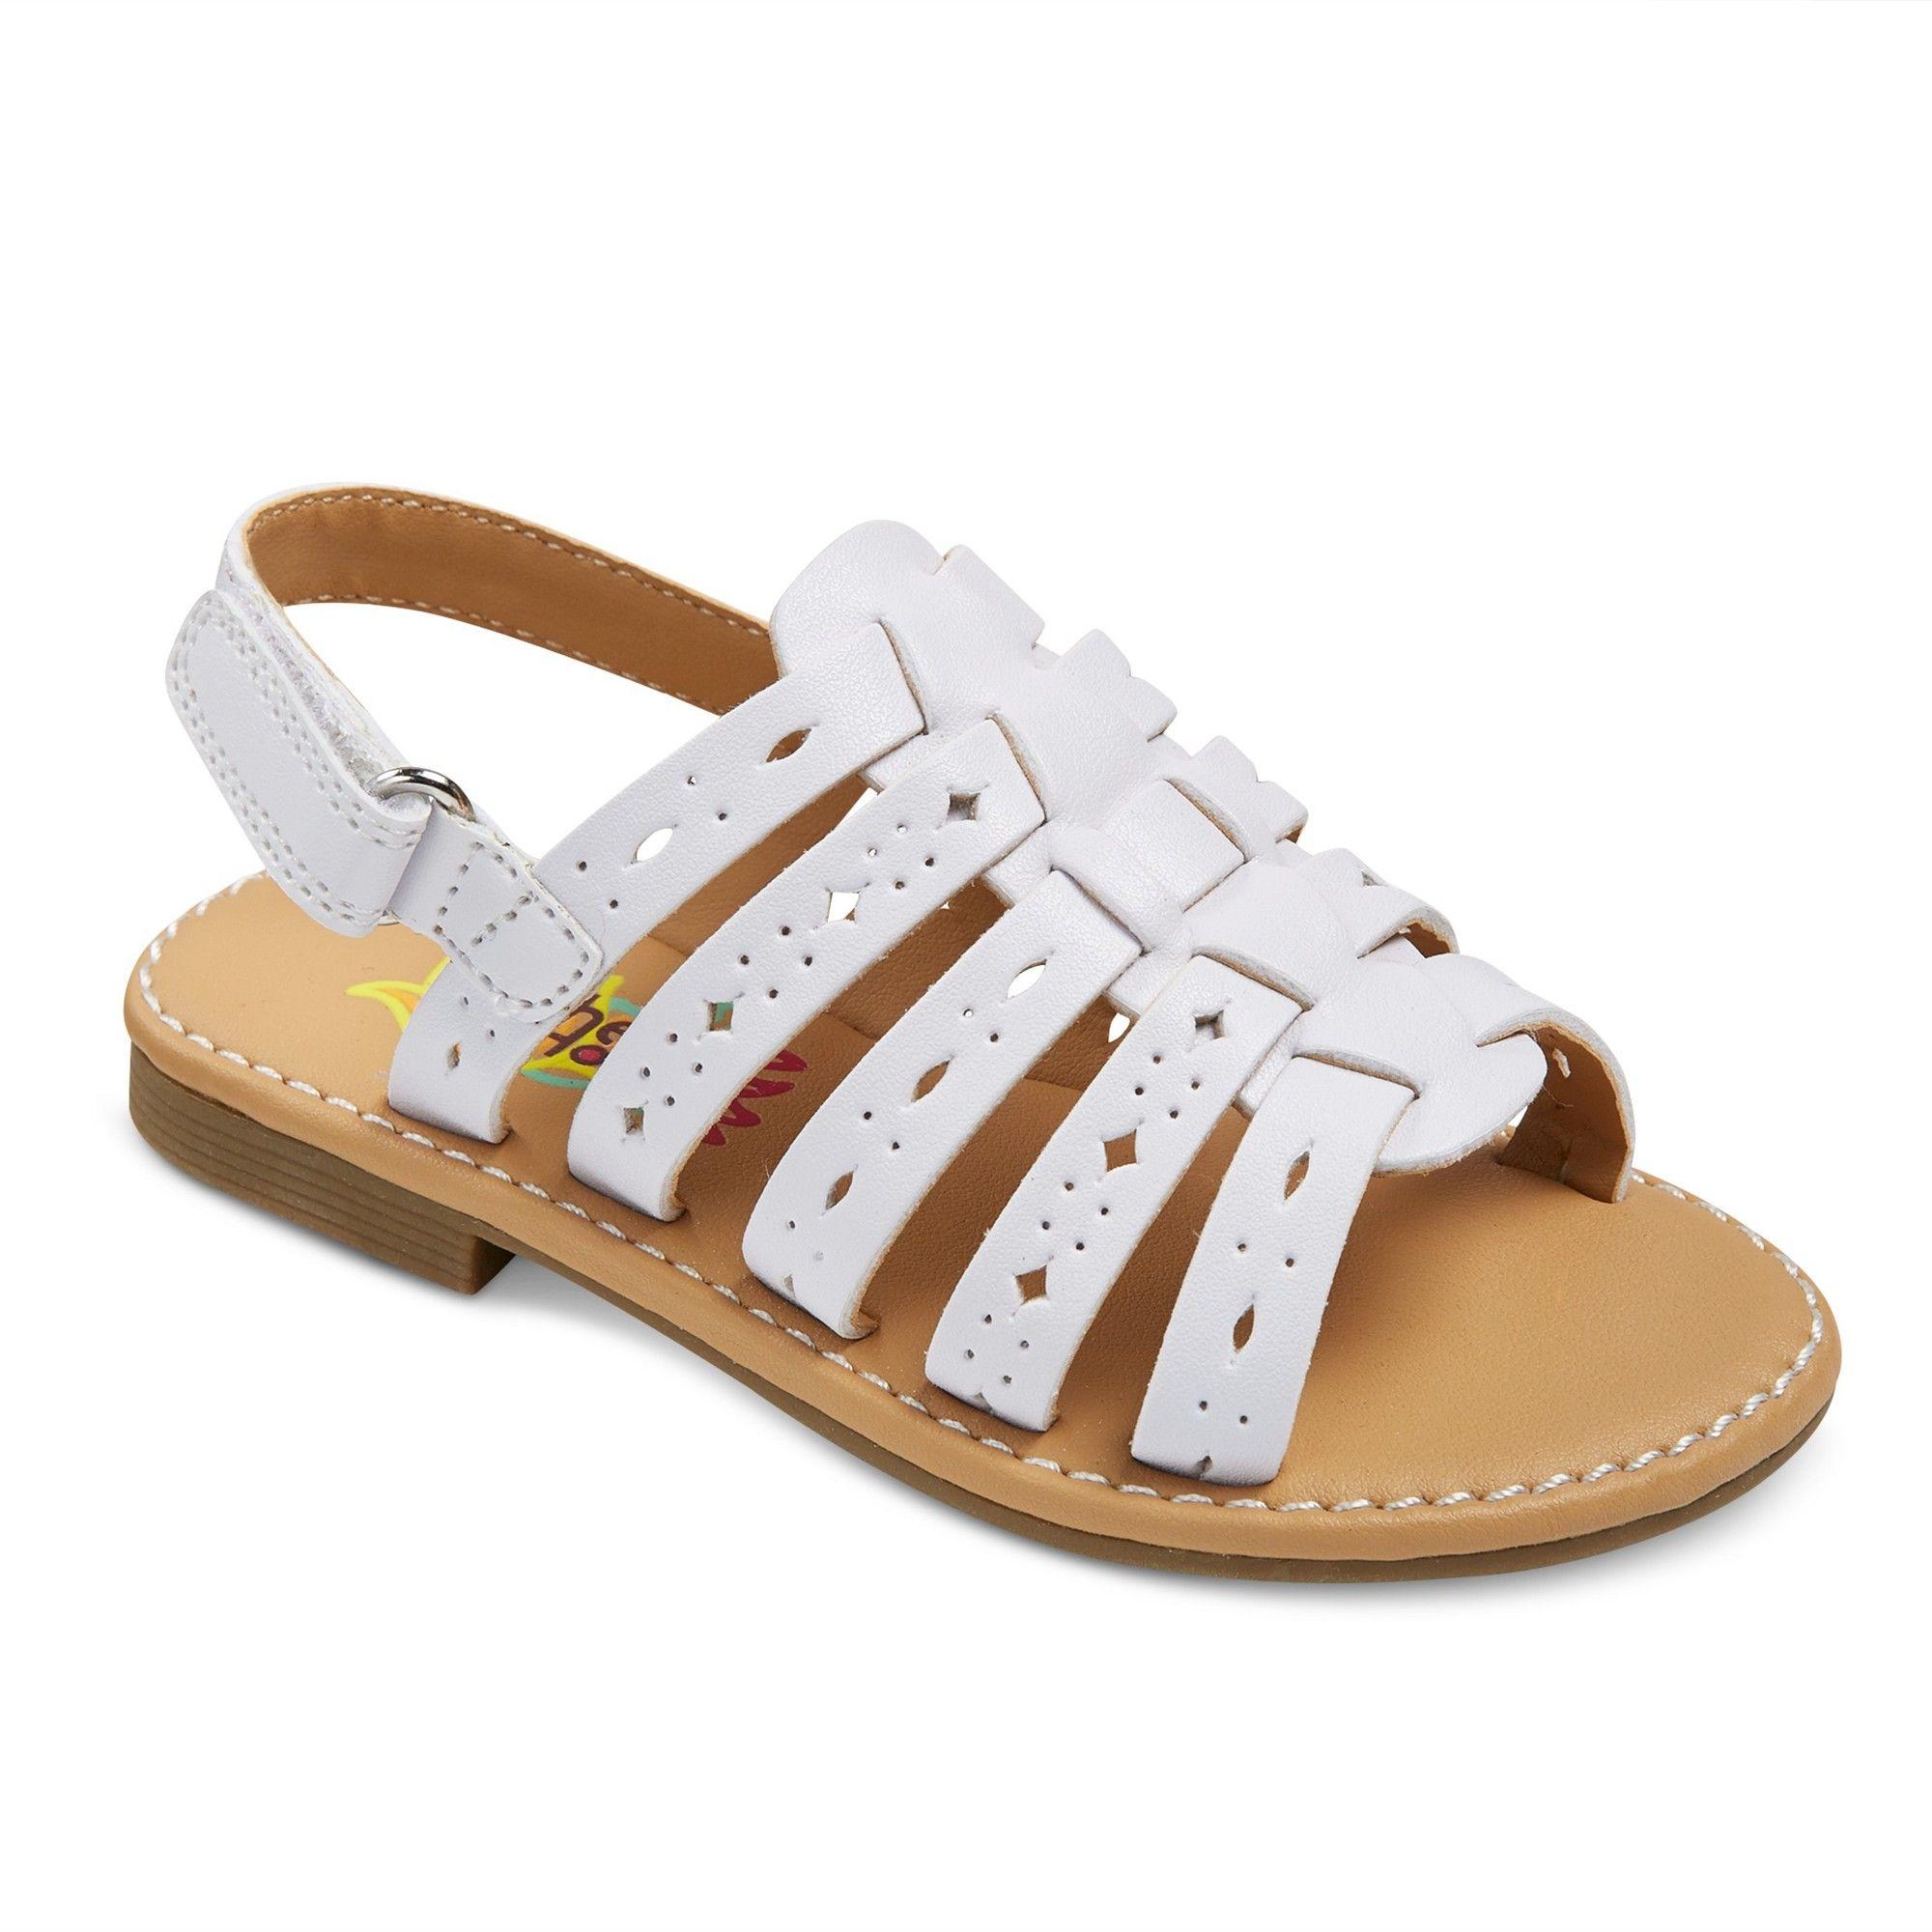 3da4a4fac474 Toddler Girls  Rachel Shoes Lil Petra Quarter Strap Sandals - White ...